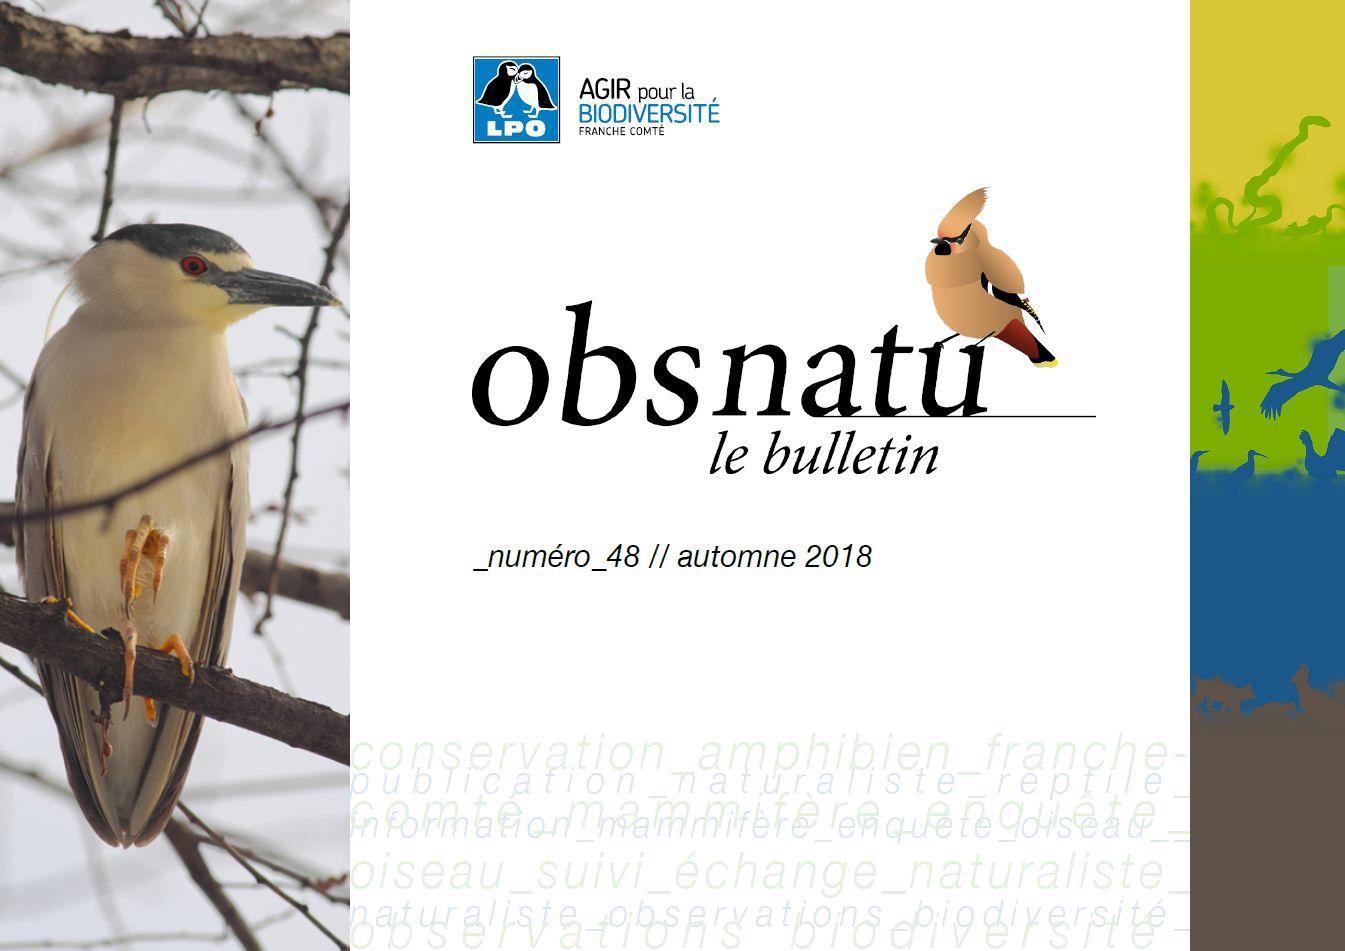 https://cdnfiles1.biolovision.net/franche-comte.lpo.fr/userfiles/publications/Obsnatubulls/Obsnatun48aut2018couv.jpg